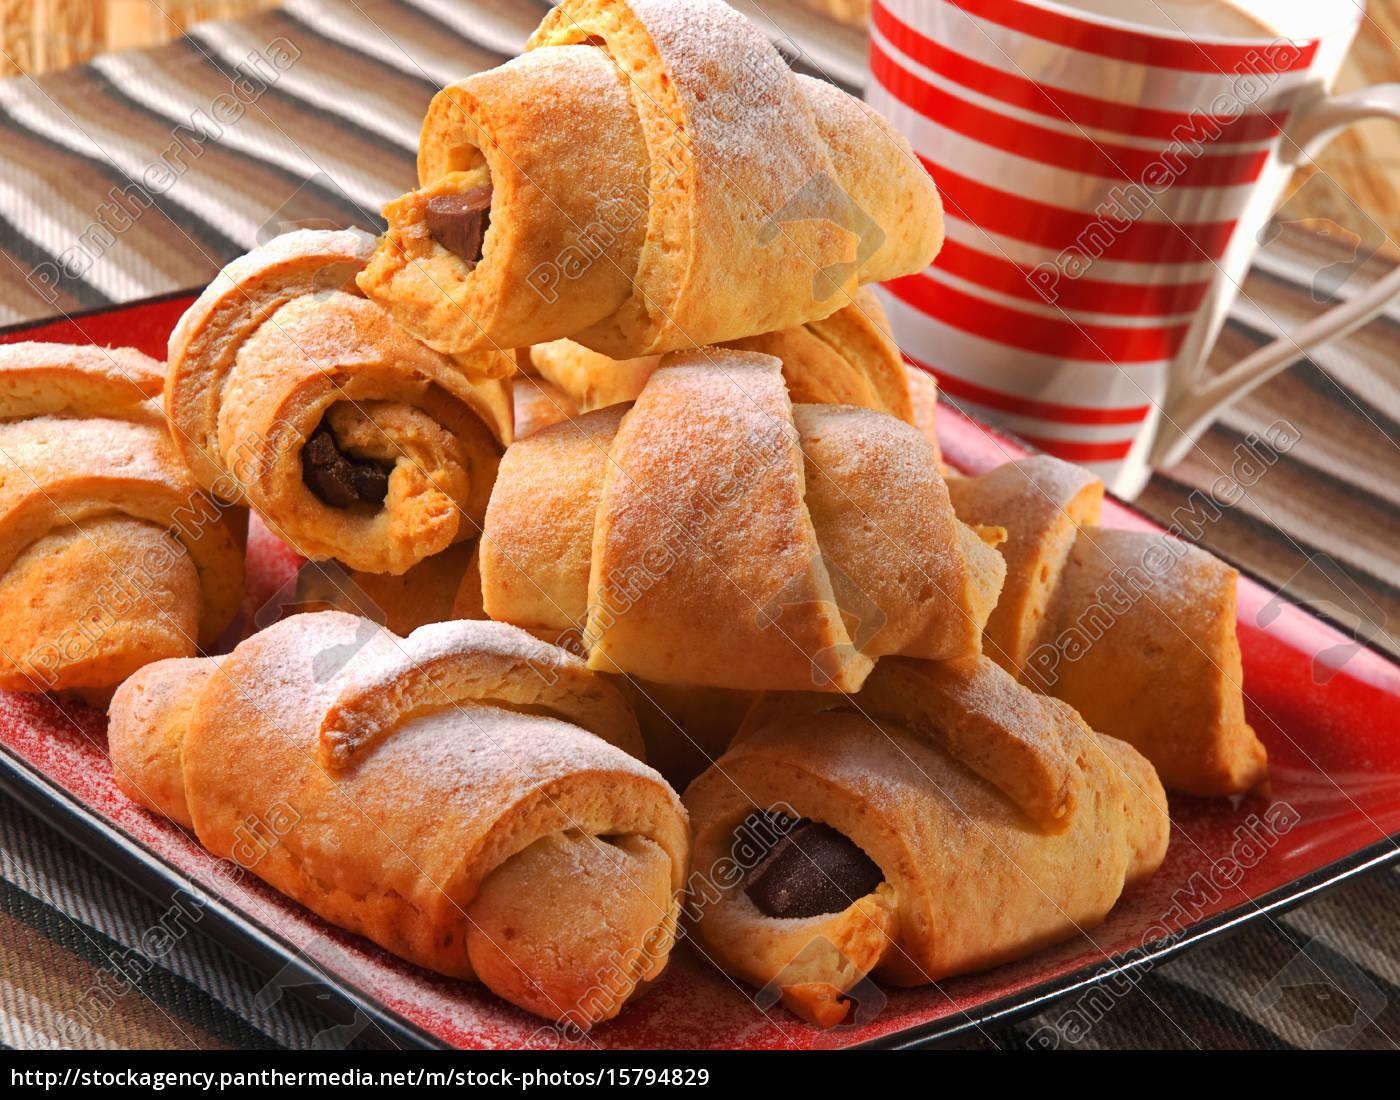 homemade, croissants, homemade, croissants, homemade, croissants, homemade, croissants - 15794829